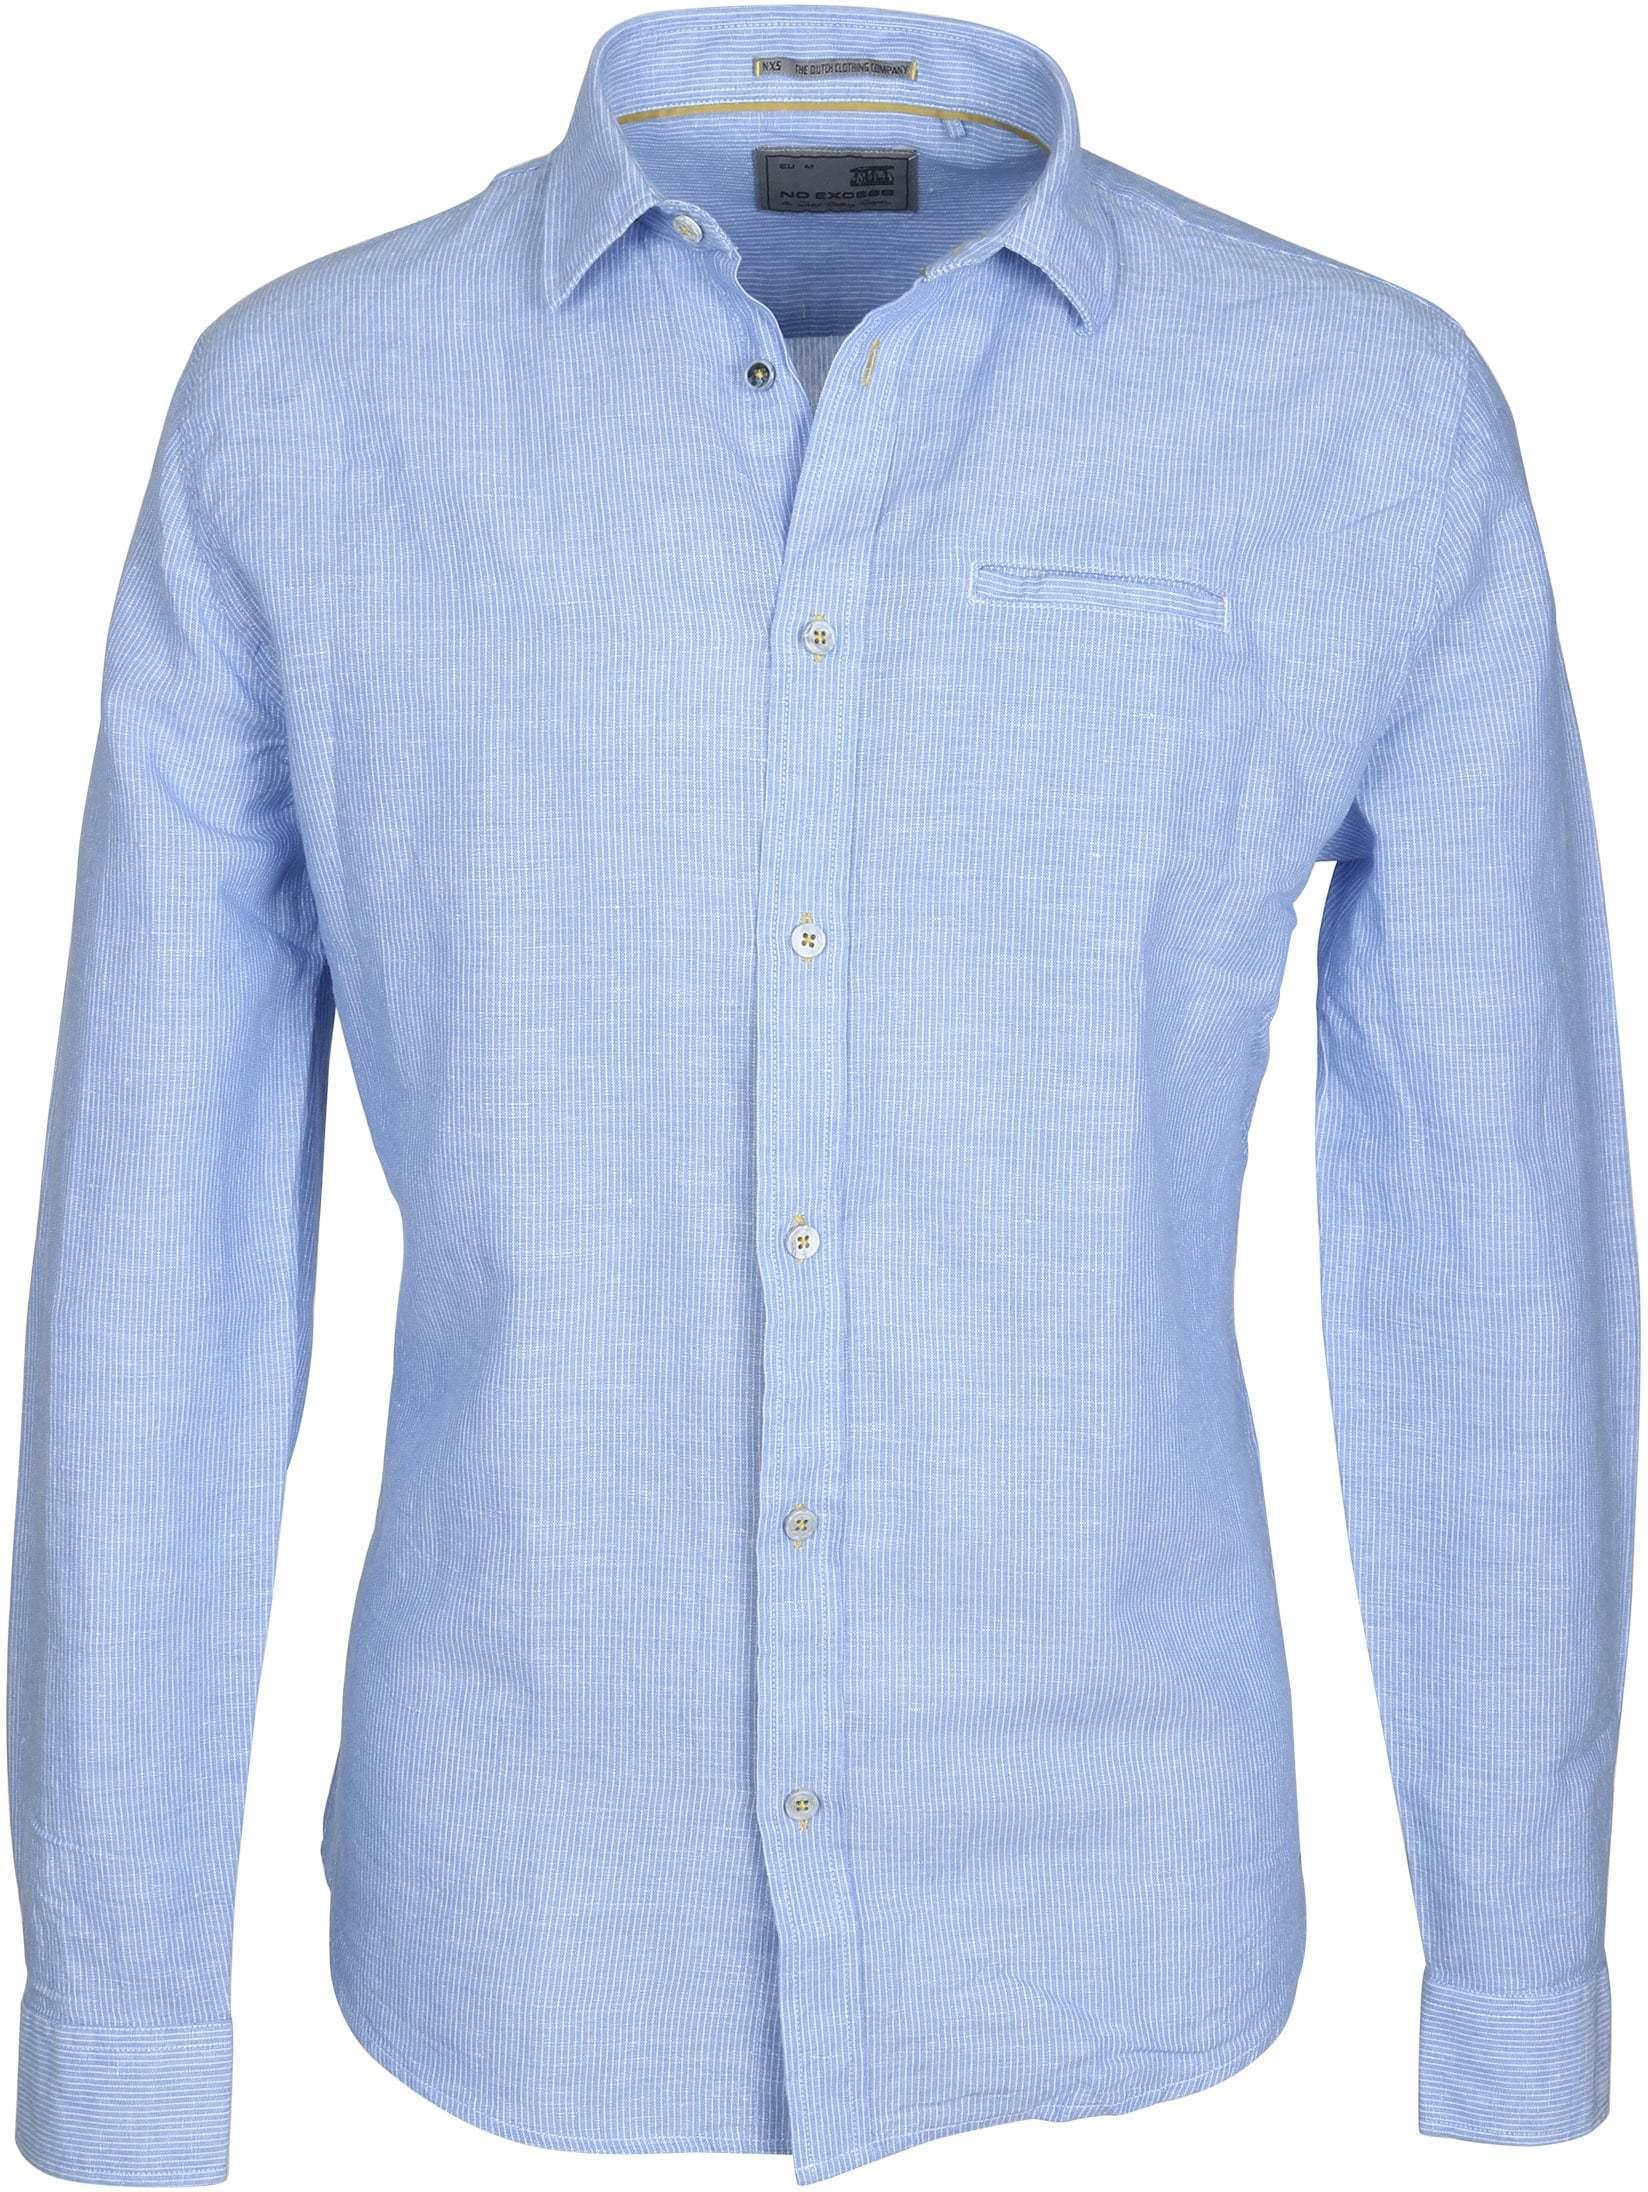 No-Excess Overhemd Blauw Streep foto 0